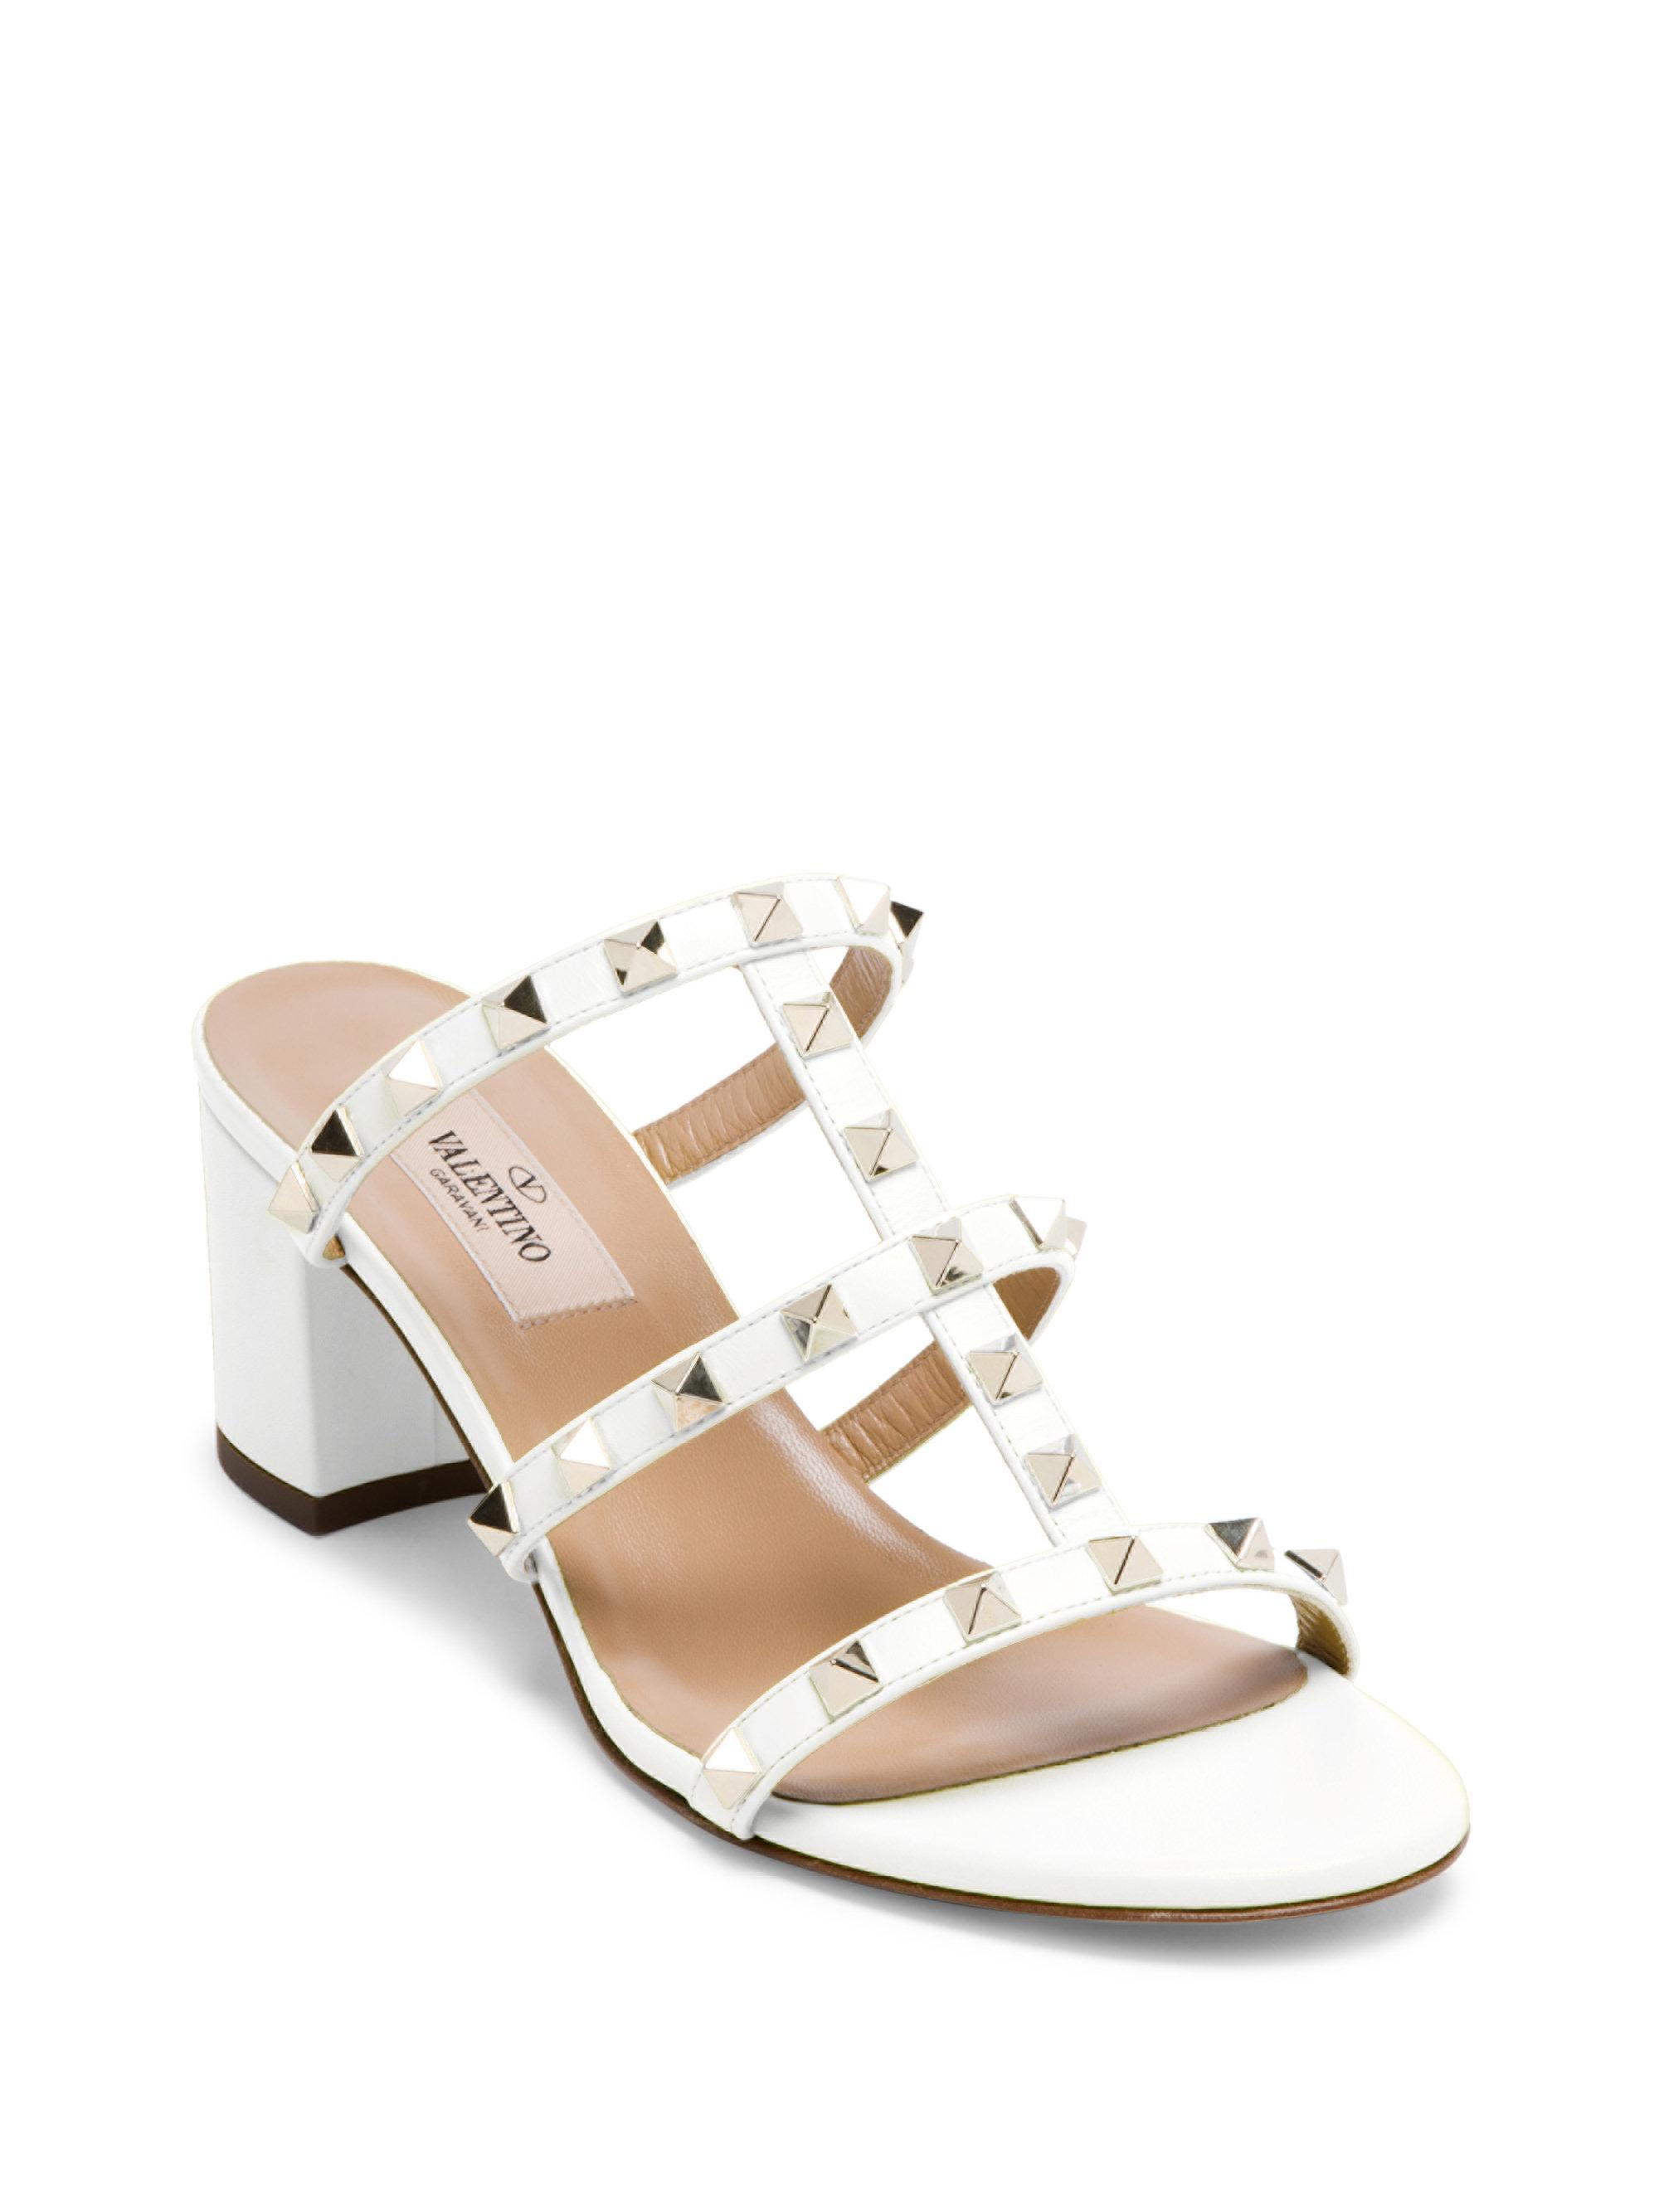 2ded1866f5 Valentino Rockstud Leather Block Heel Slides in White - Lyst